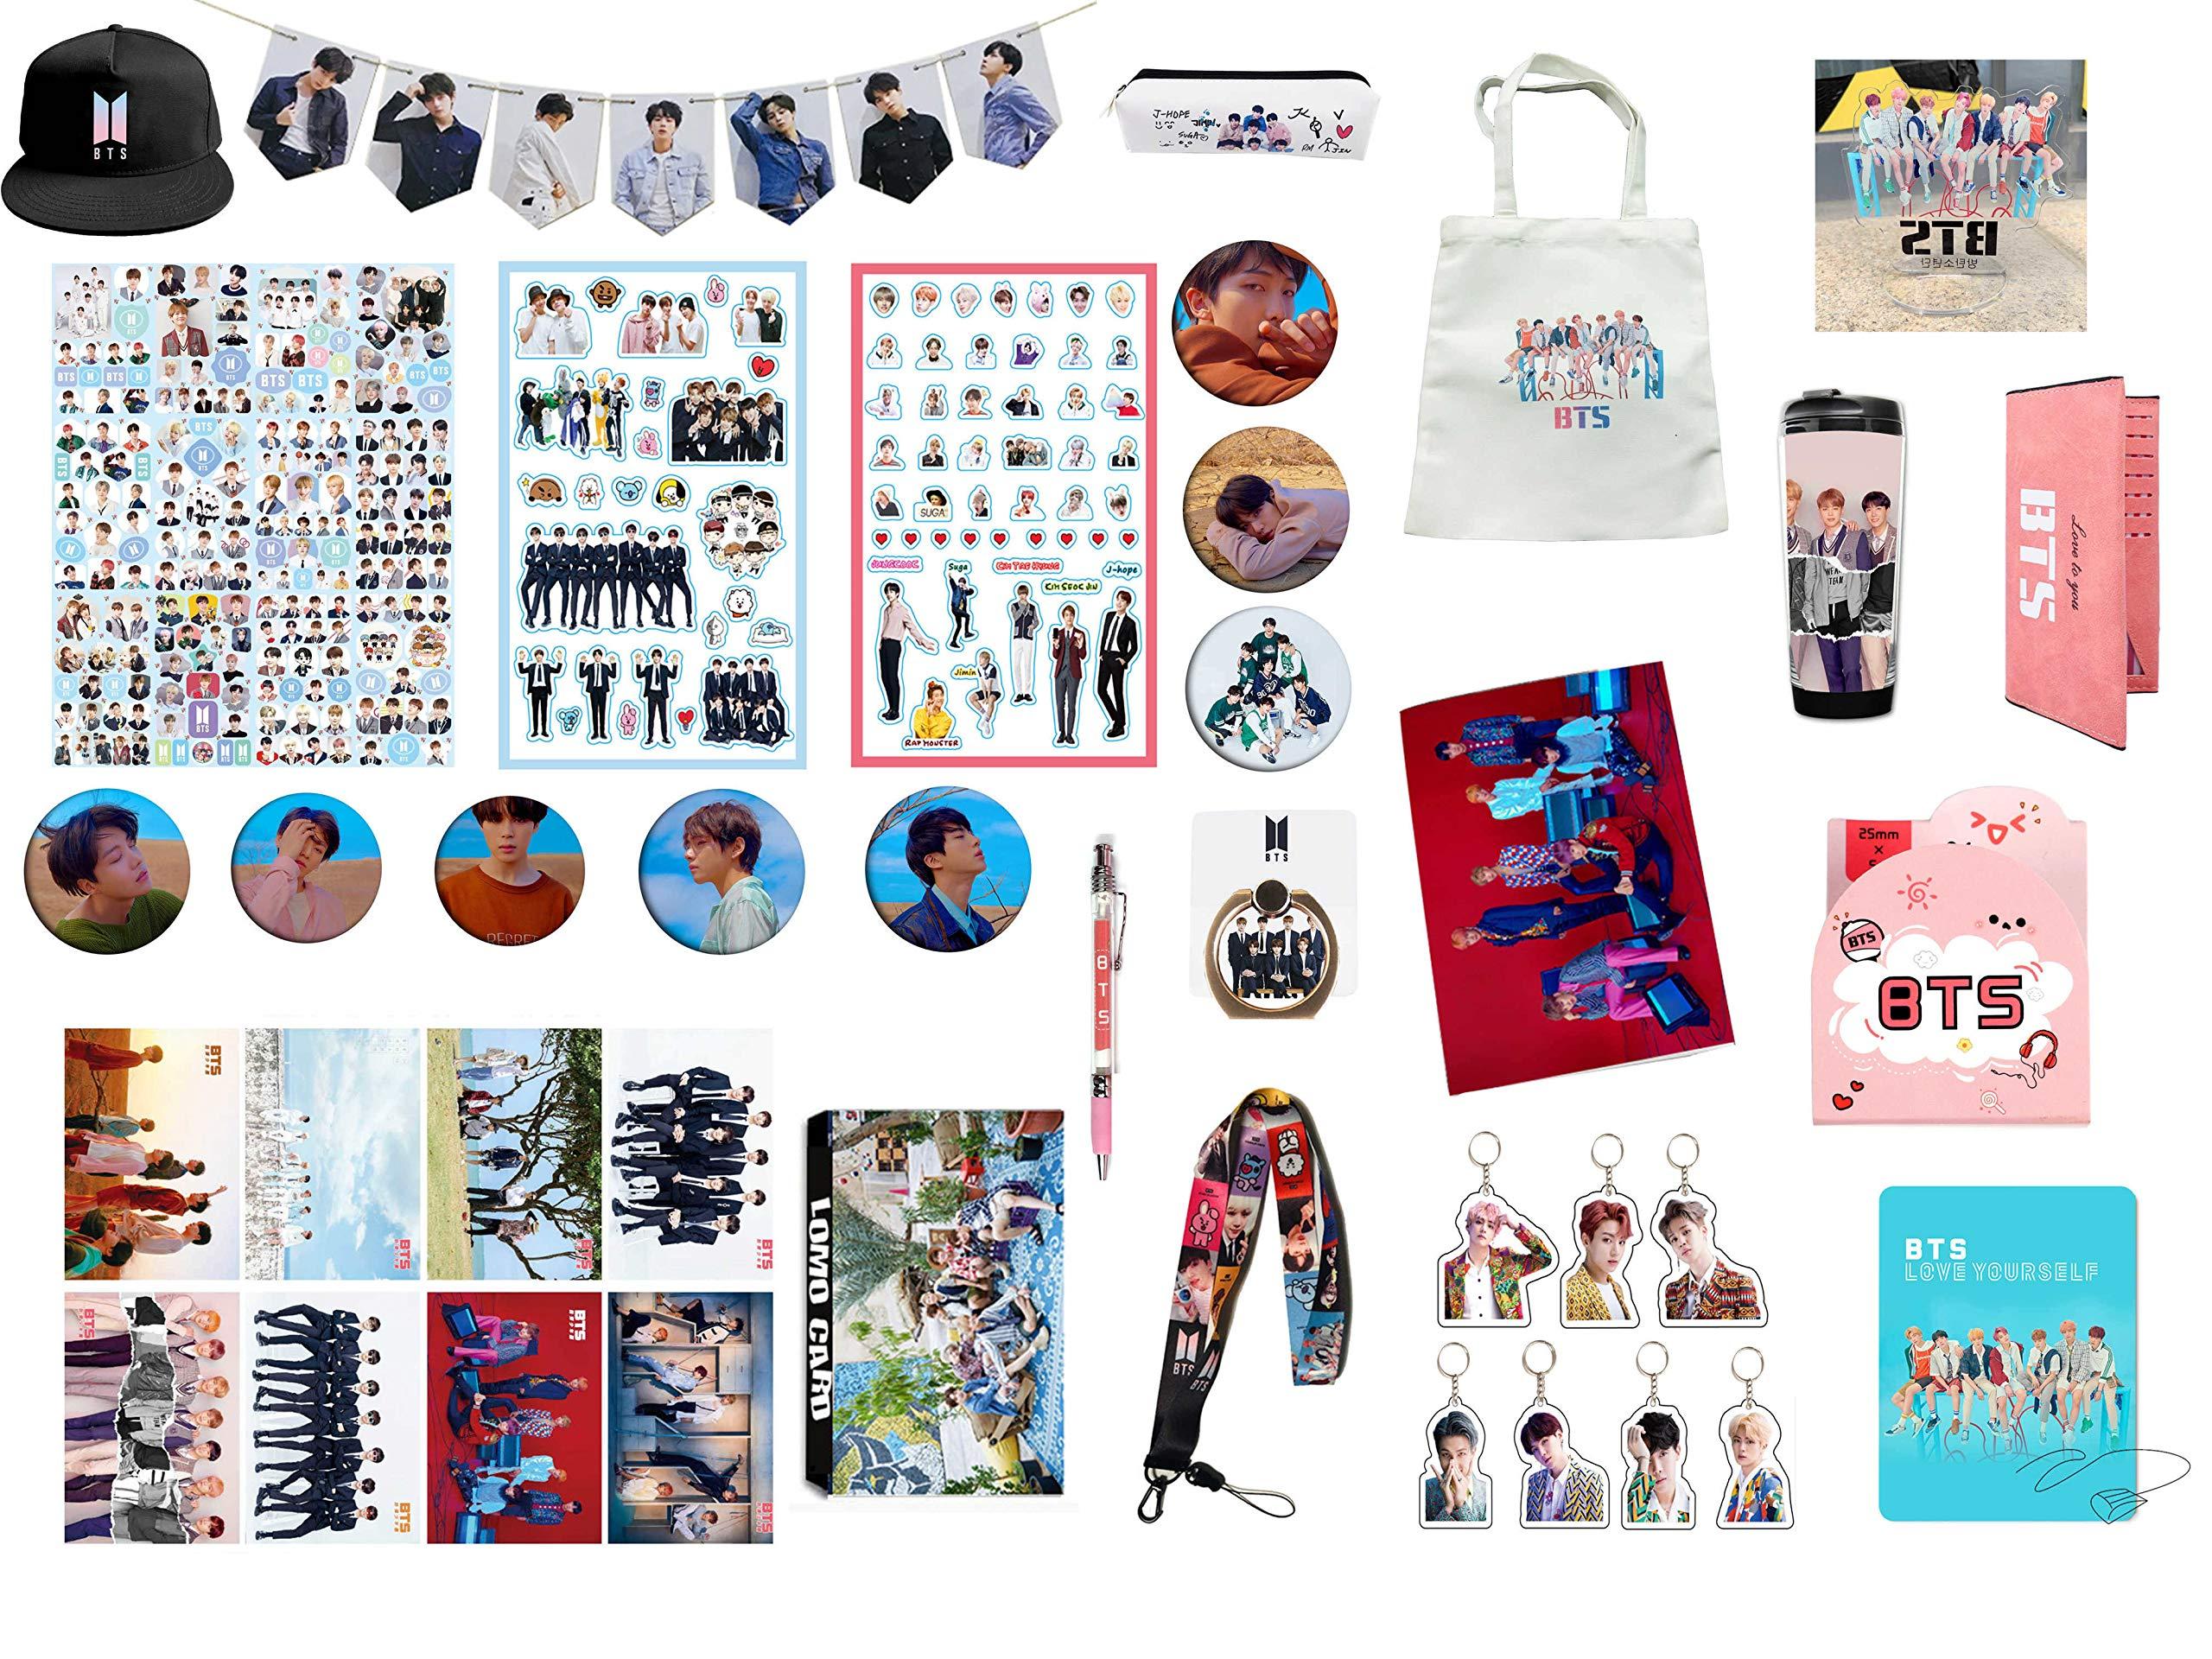 BTS Gifts Set for Army Bangtan Boys BTS Collectibles, BTS Pin, BTS Poster, BTS Sticker, etc (7)